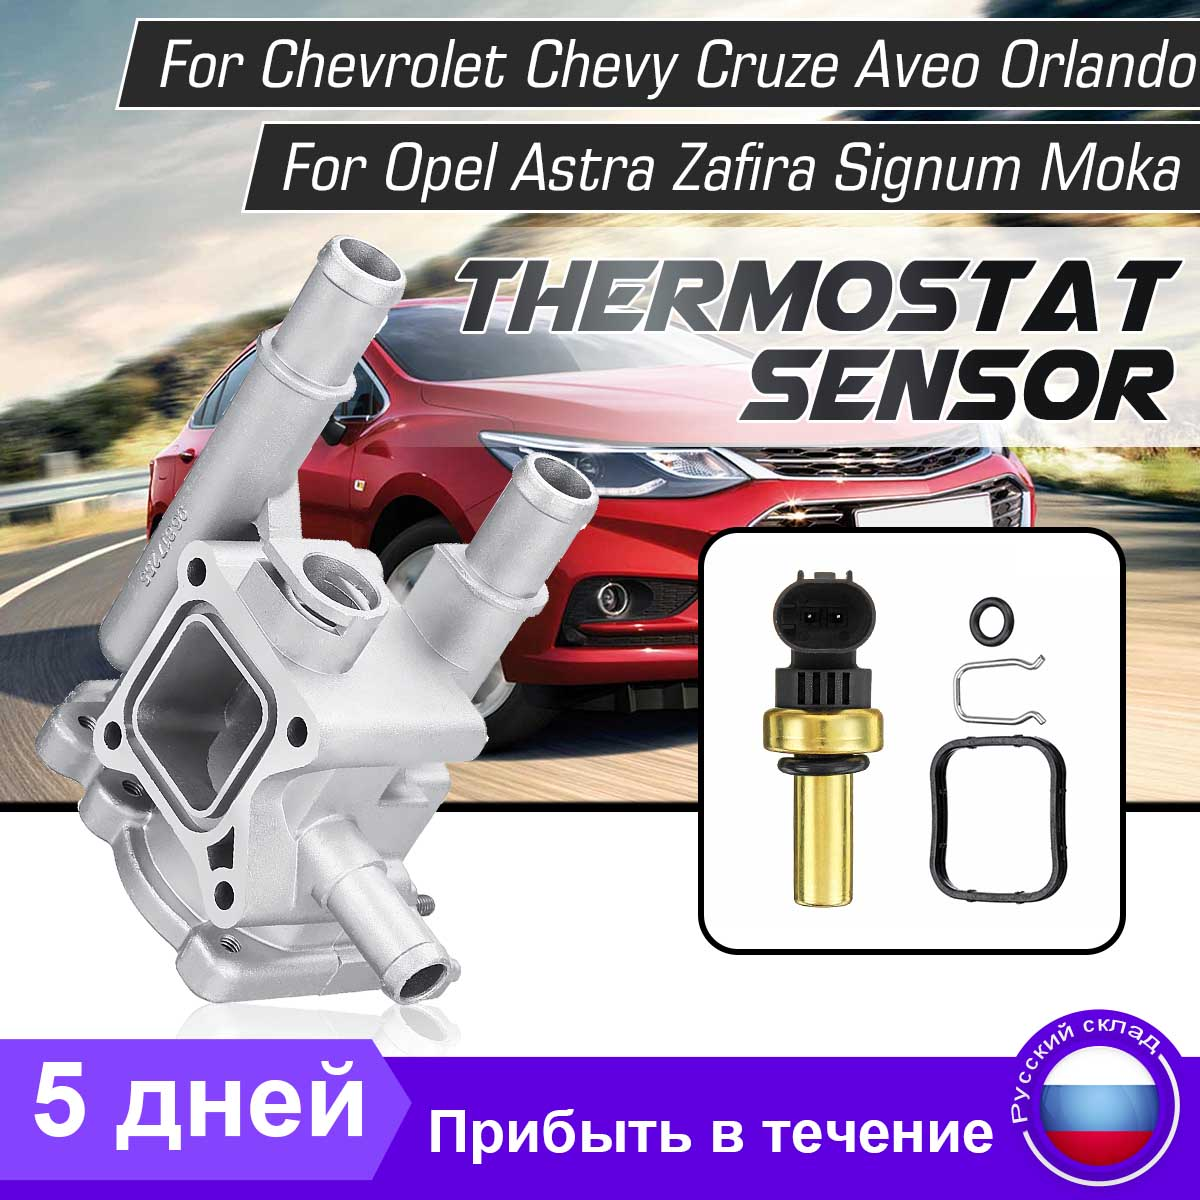 Алюминиевая крышка корпуса термостата 96984103 96817255 для Chevrolet Chevy для Cruze Aveo Orlando для Opel Astra Zafira Signum Moka